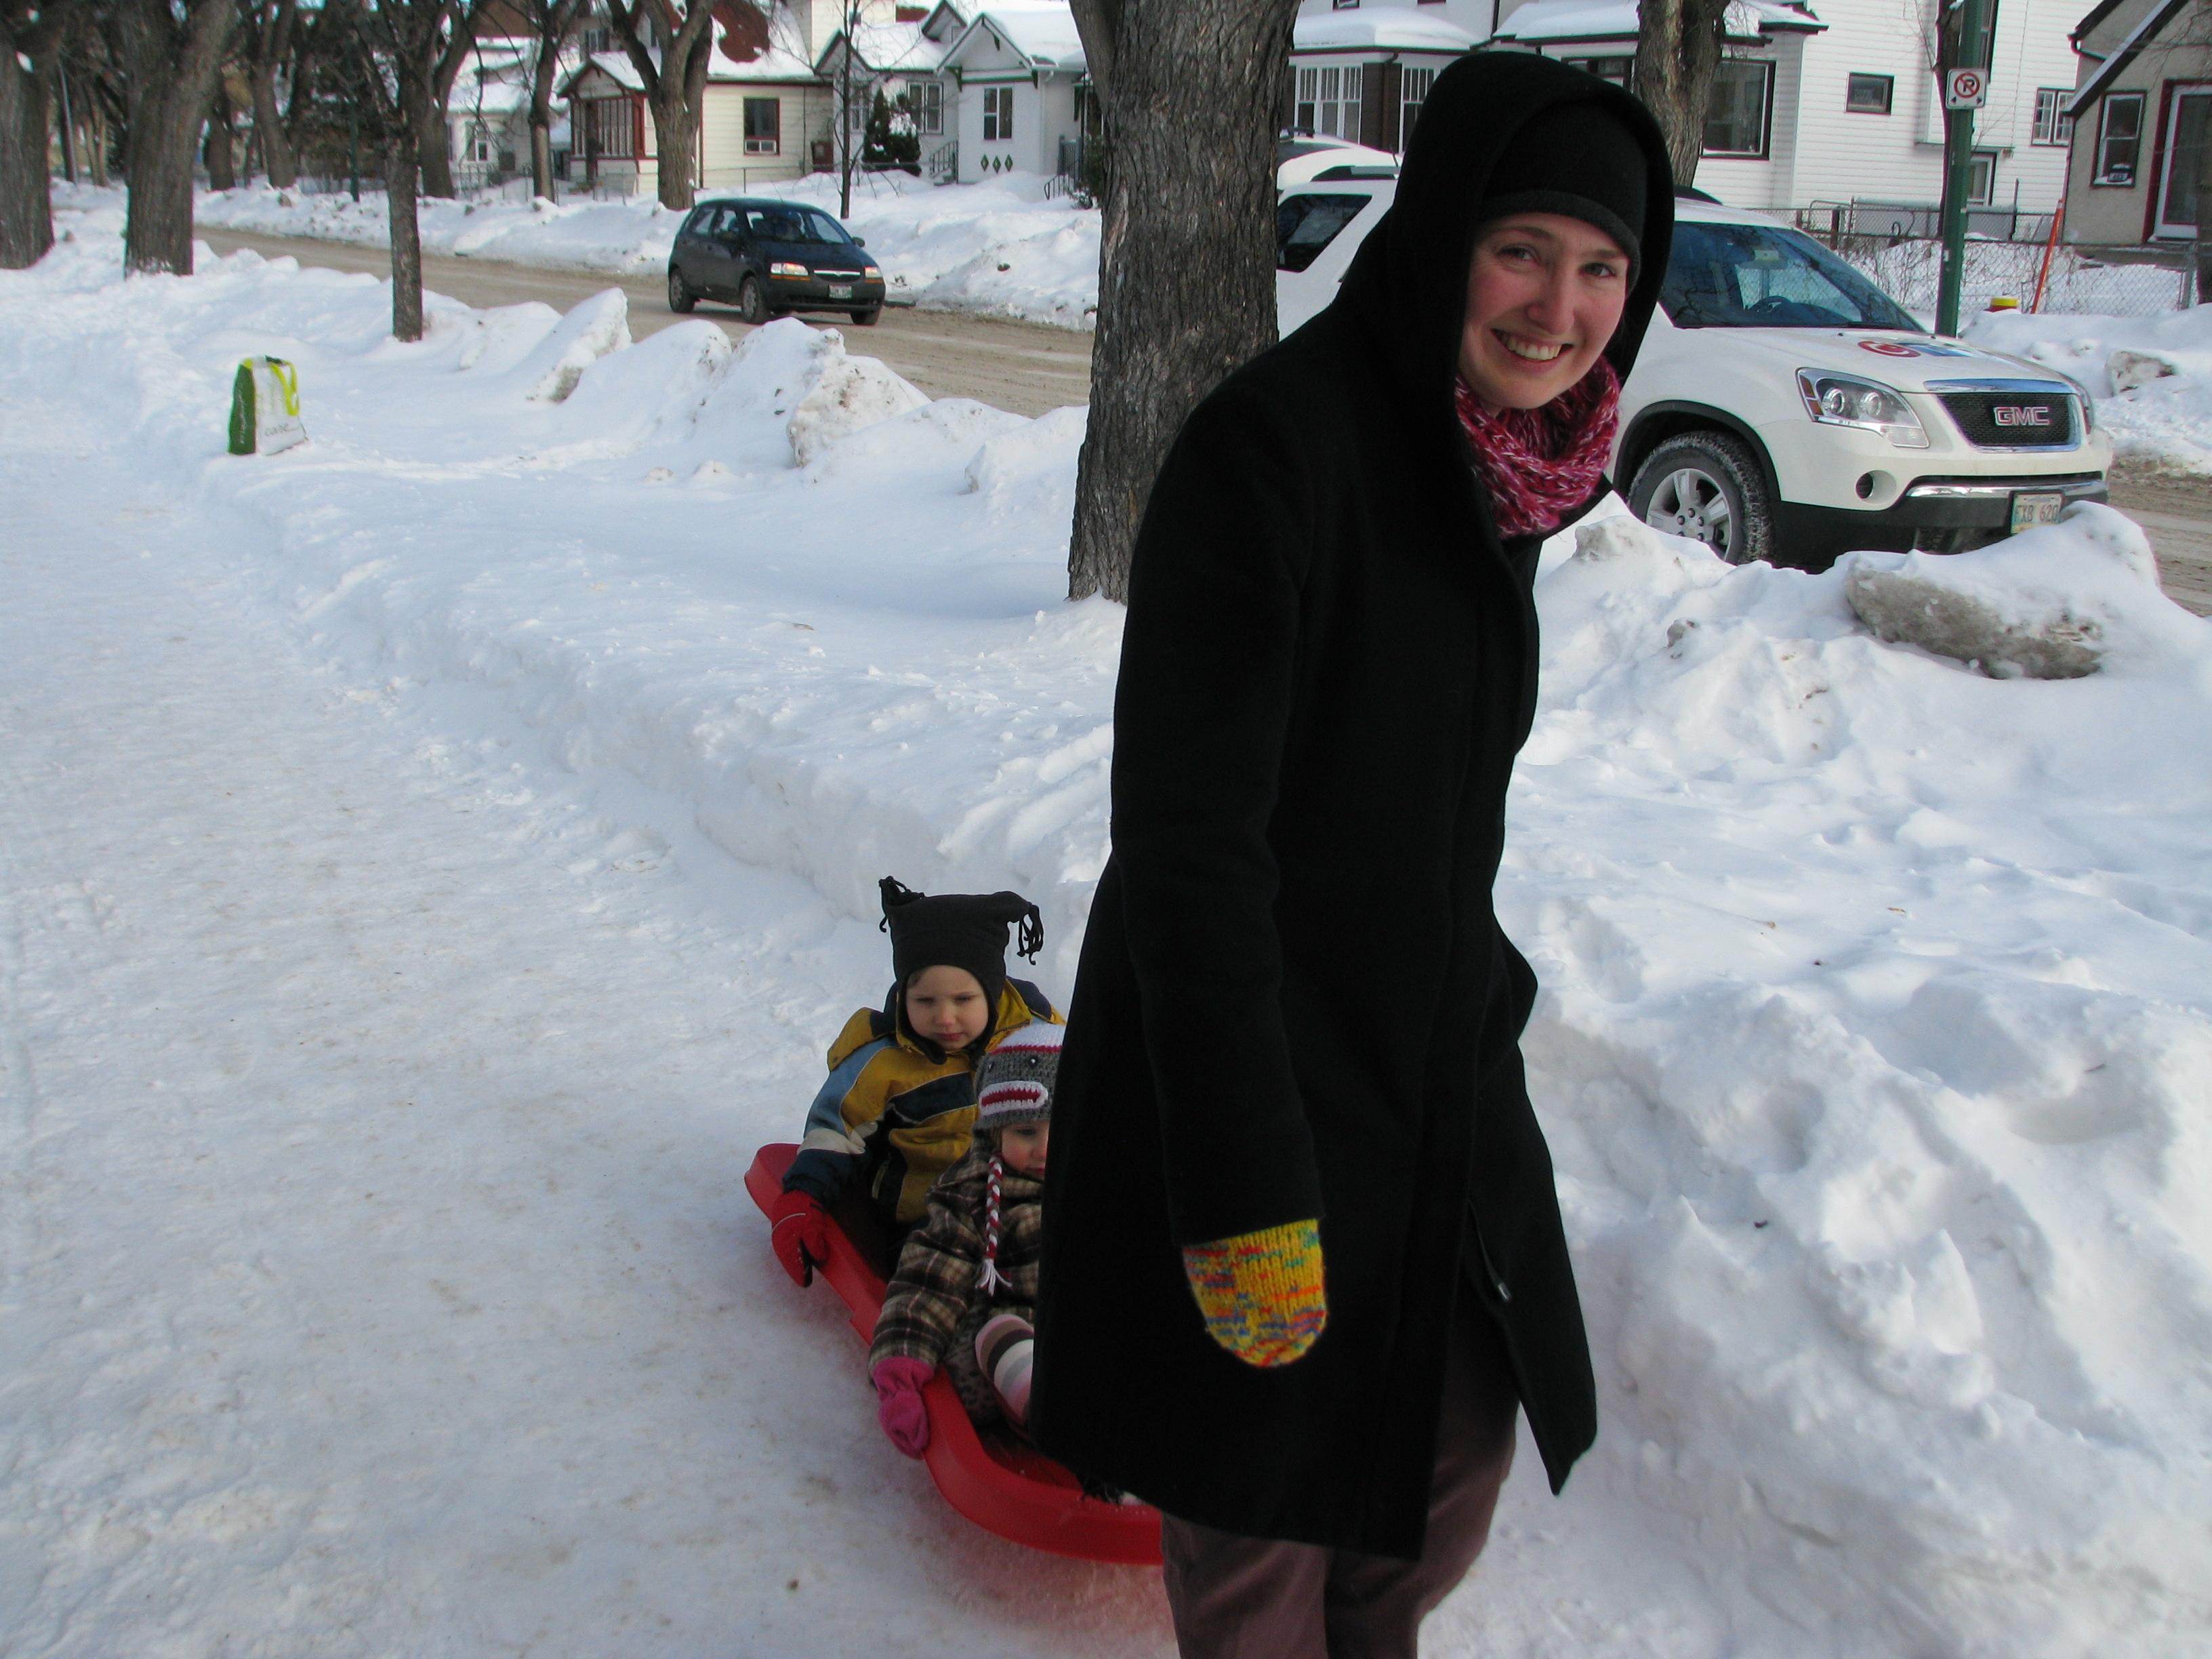 Bougeons en hiver: The Jack Frost Challenge 2013